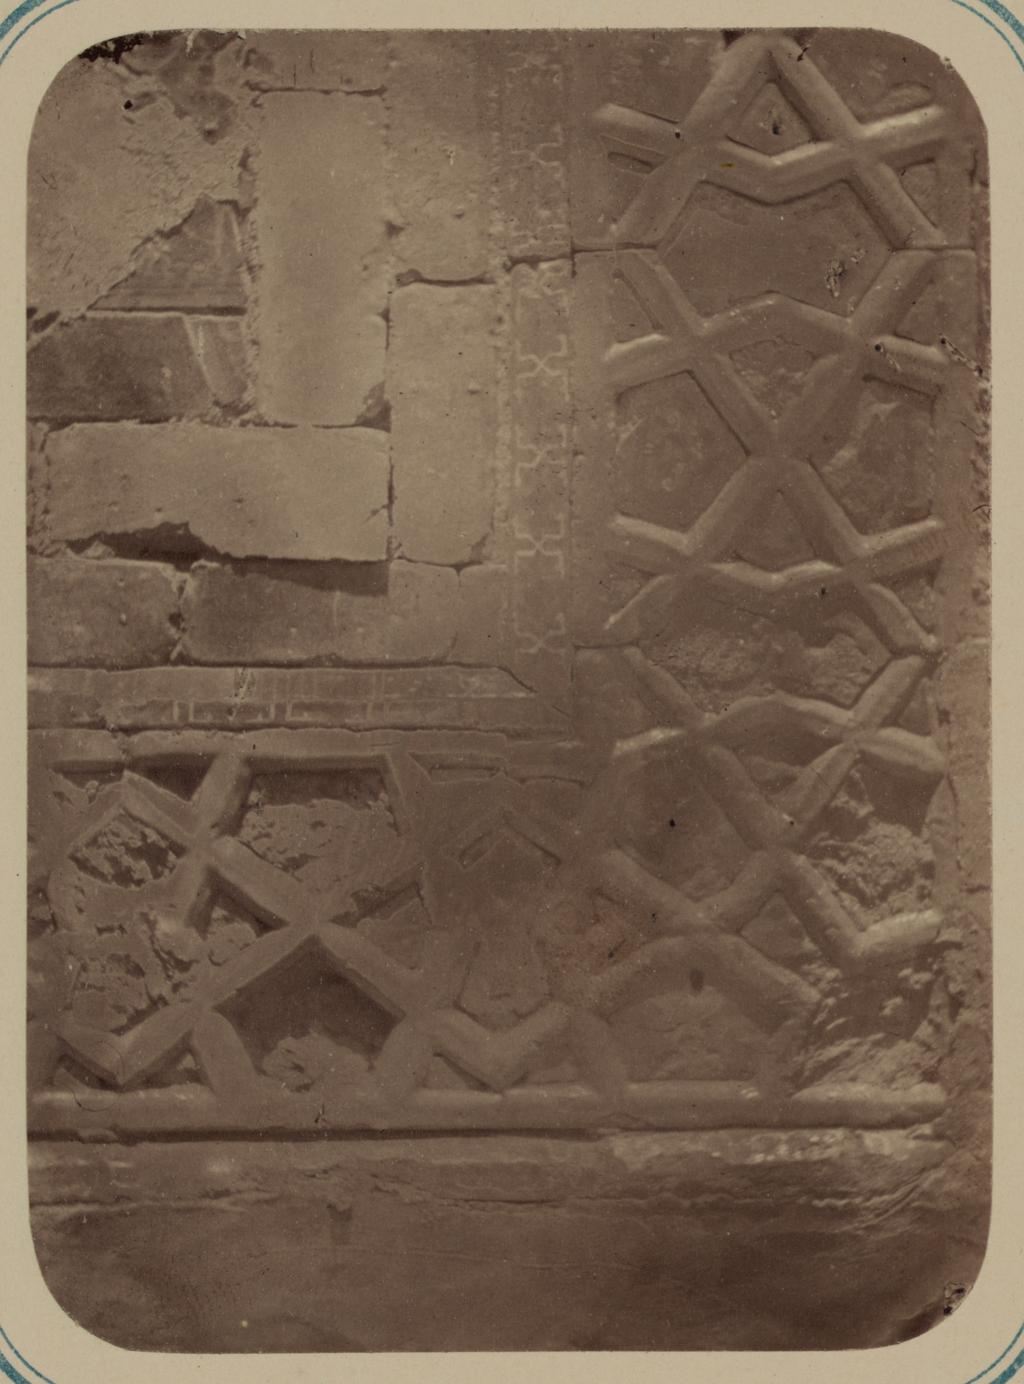 Мавзолей эмира Ассада. Часть элемента (бордюра) фасада